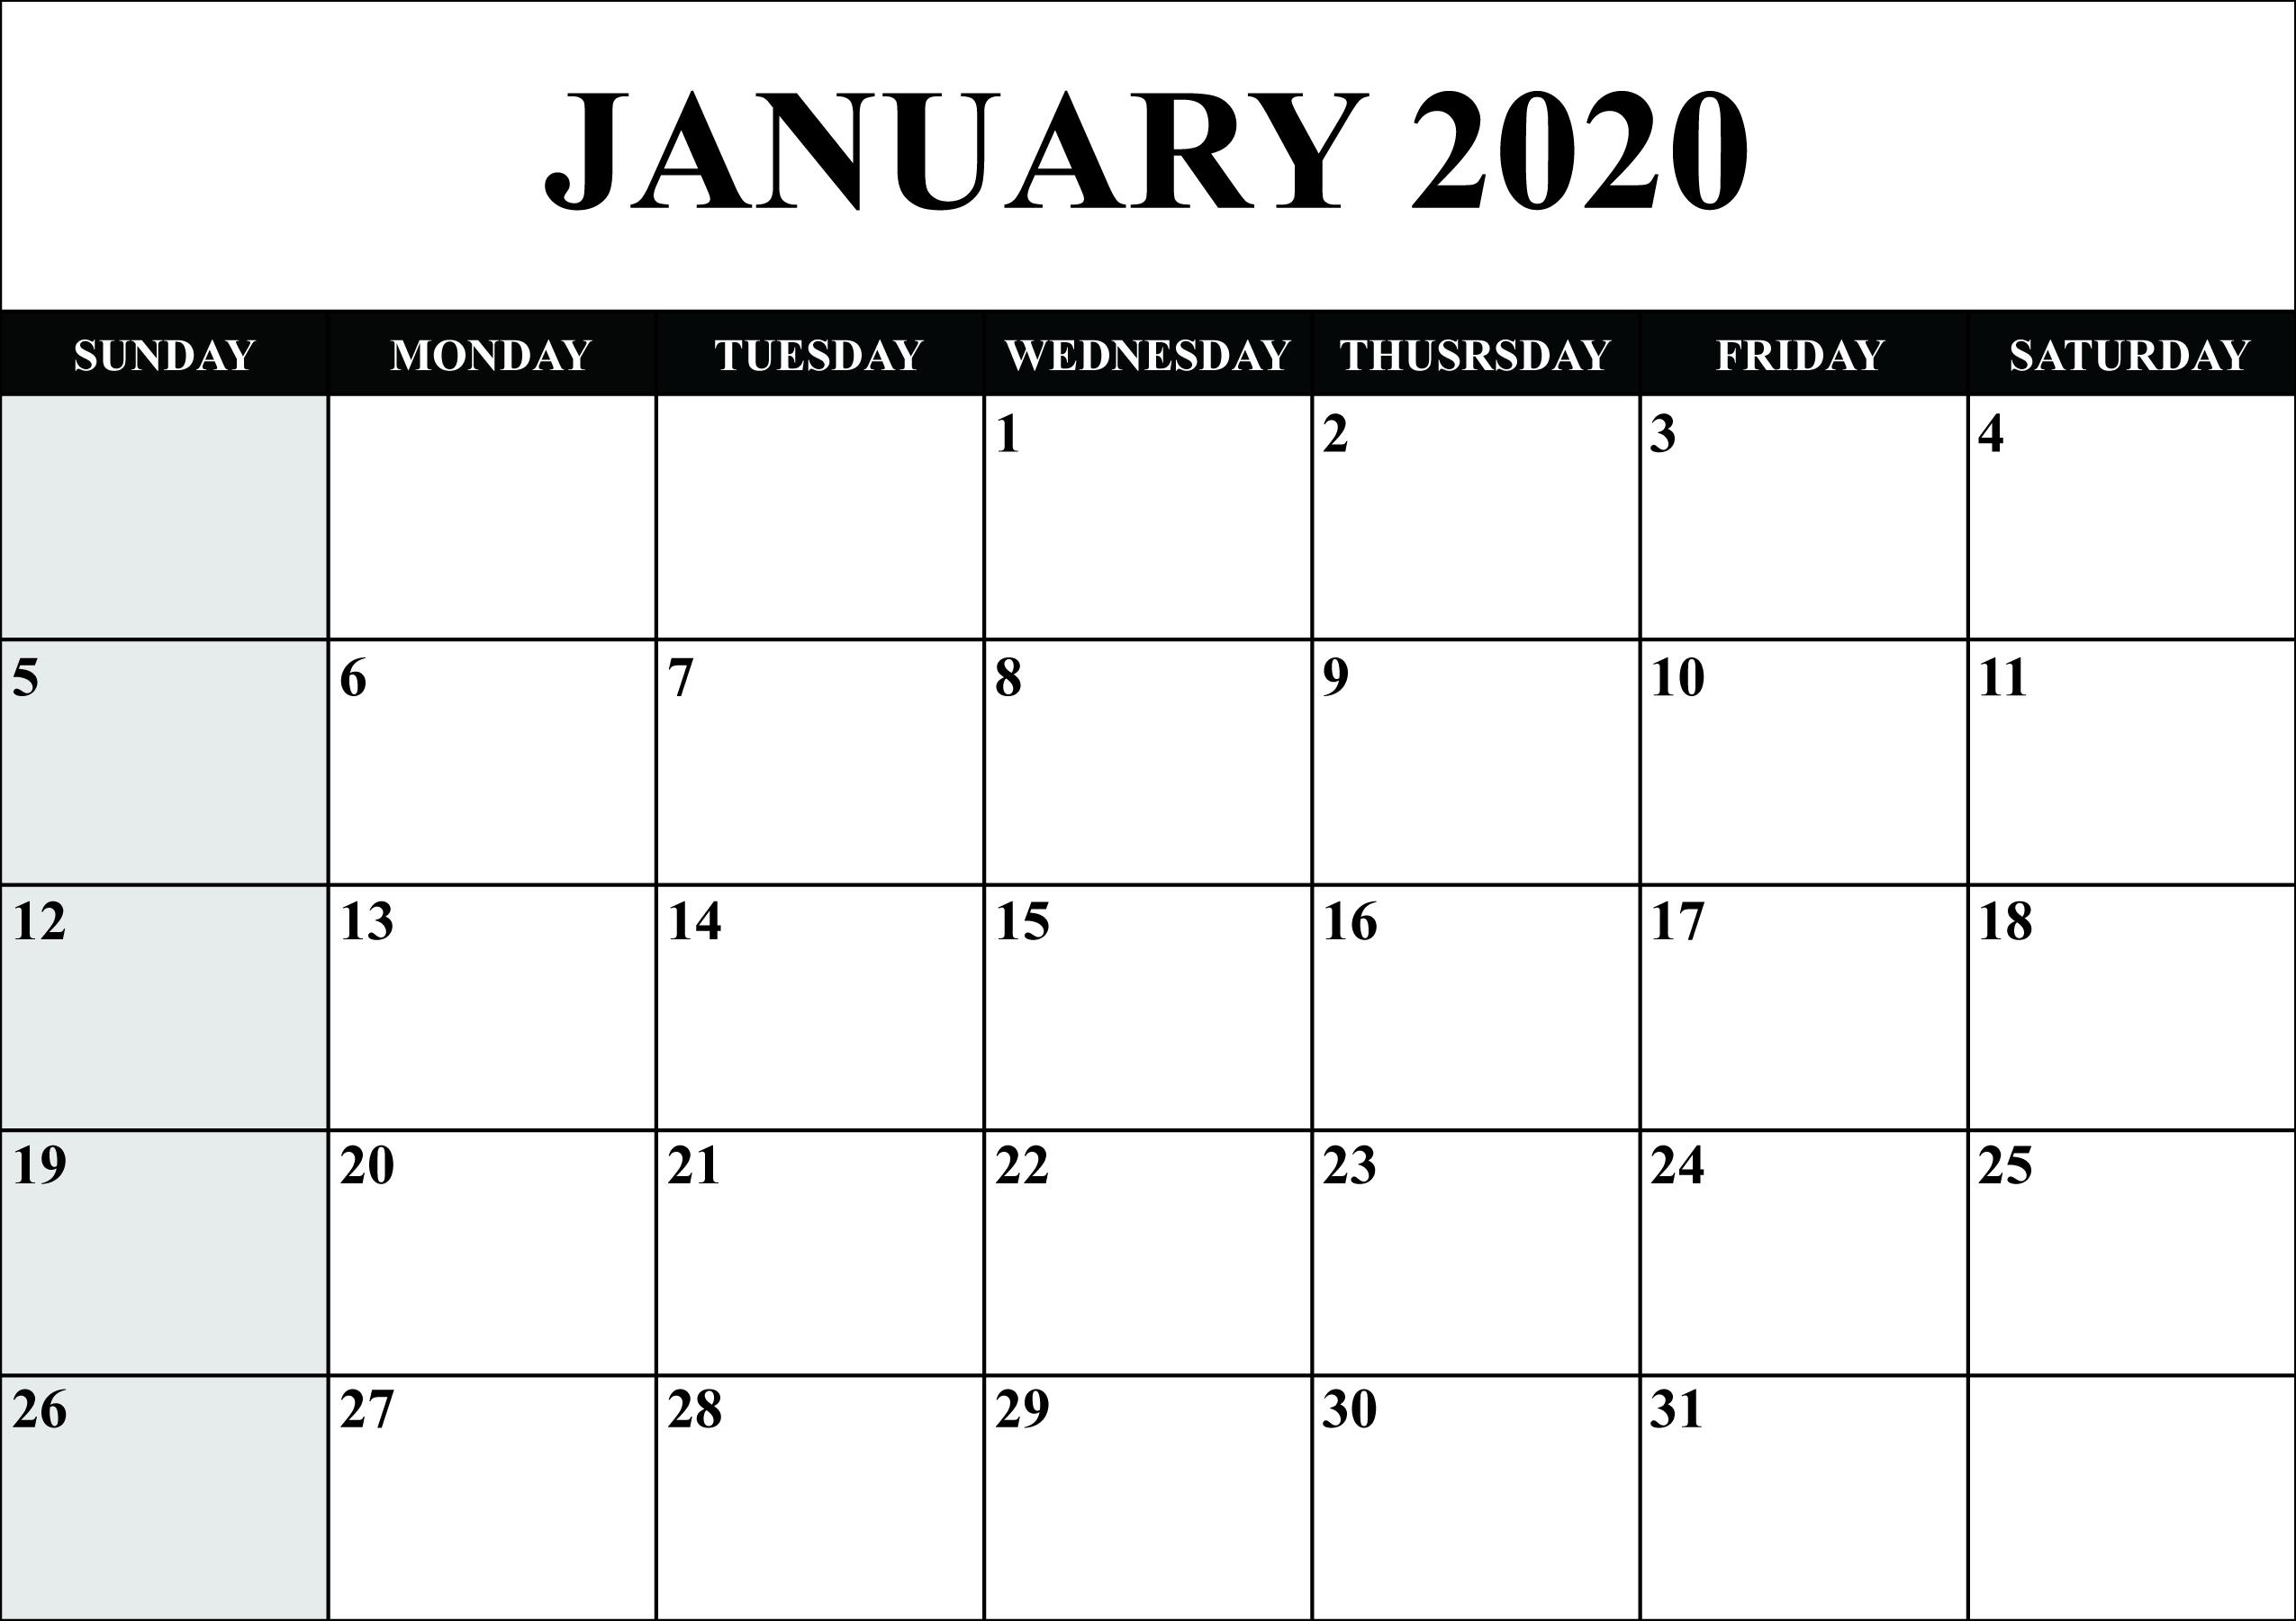 Monthly January 2020 Calendar Blank